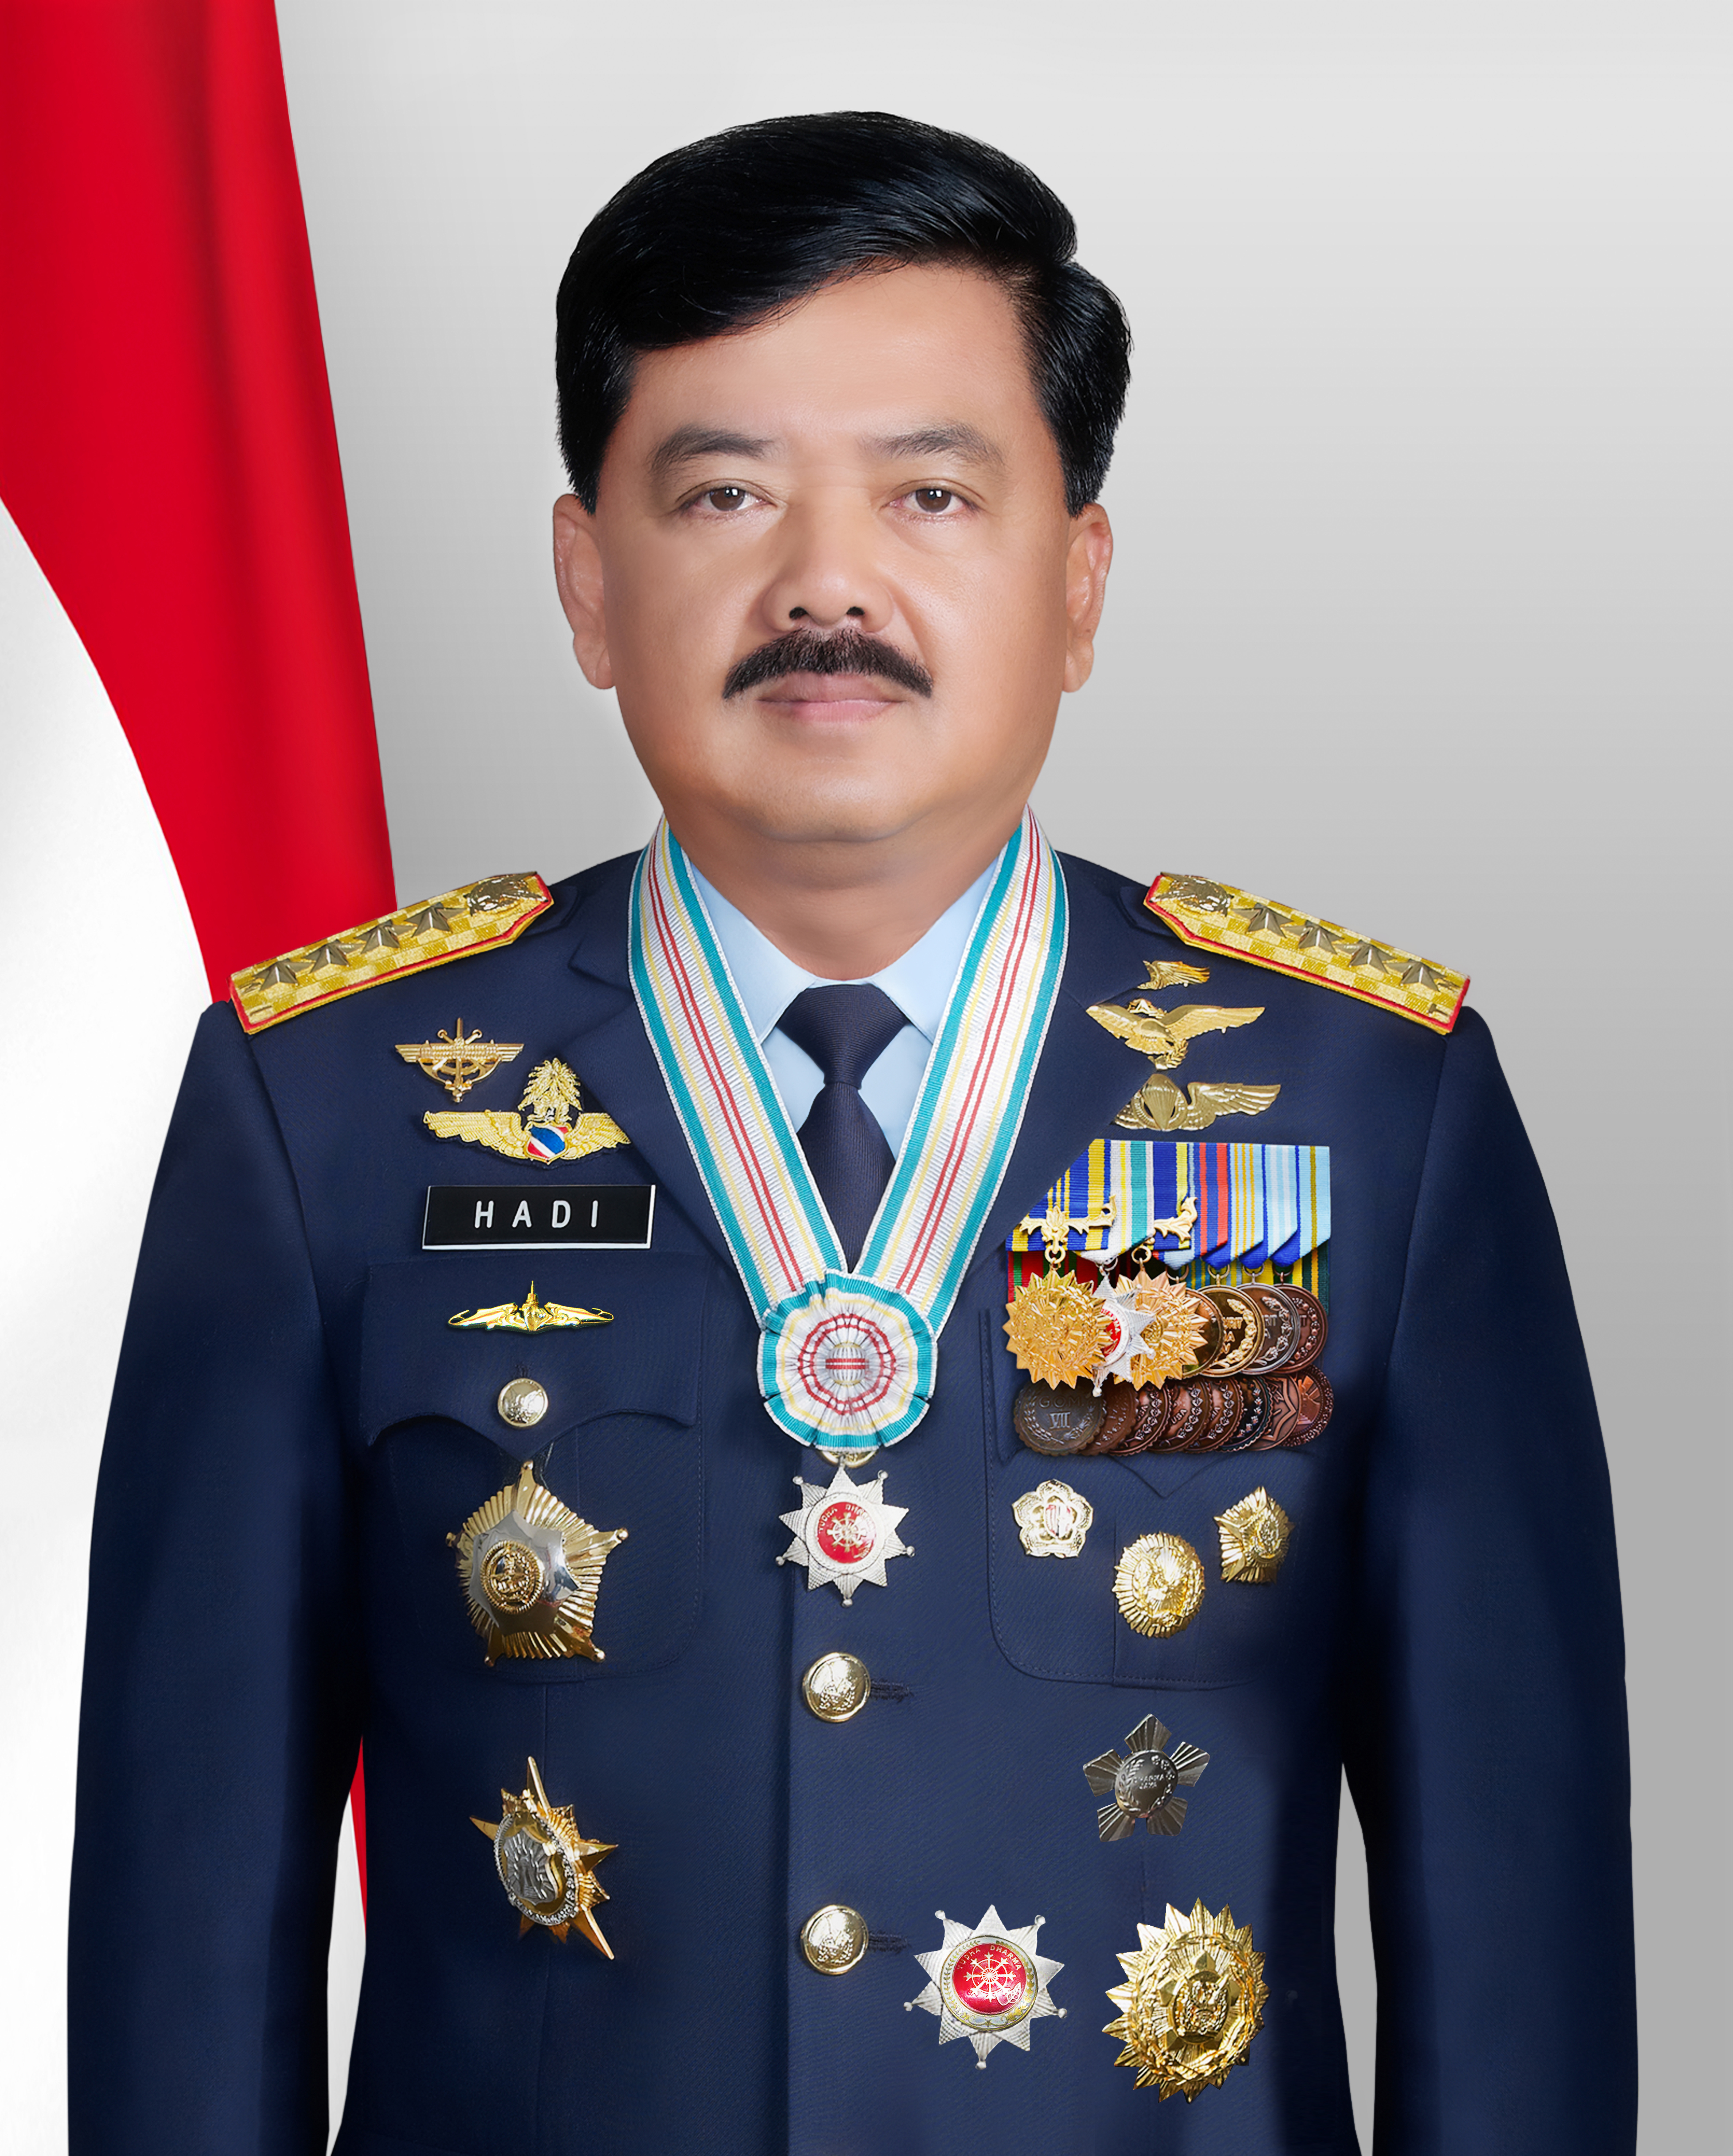 Hadi Tjahjanto Indonesian Air Chief Marshal